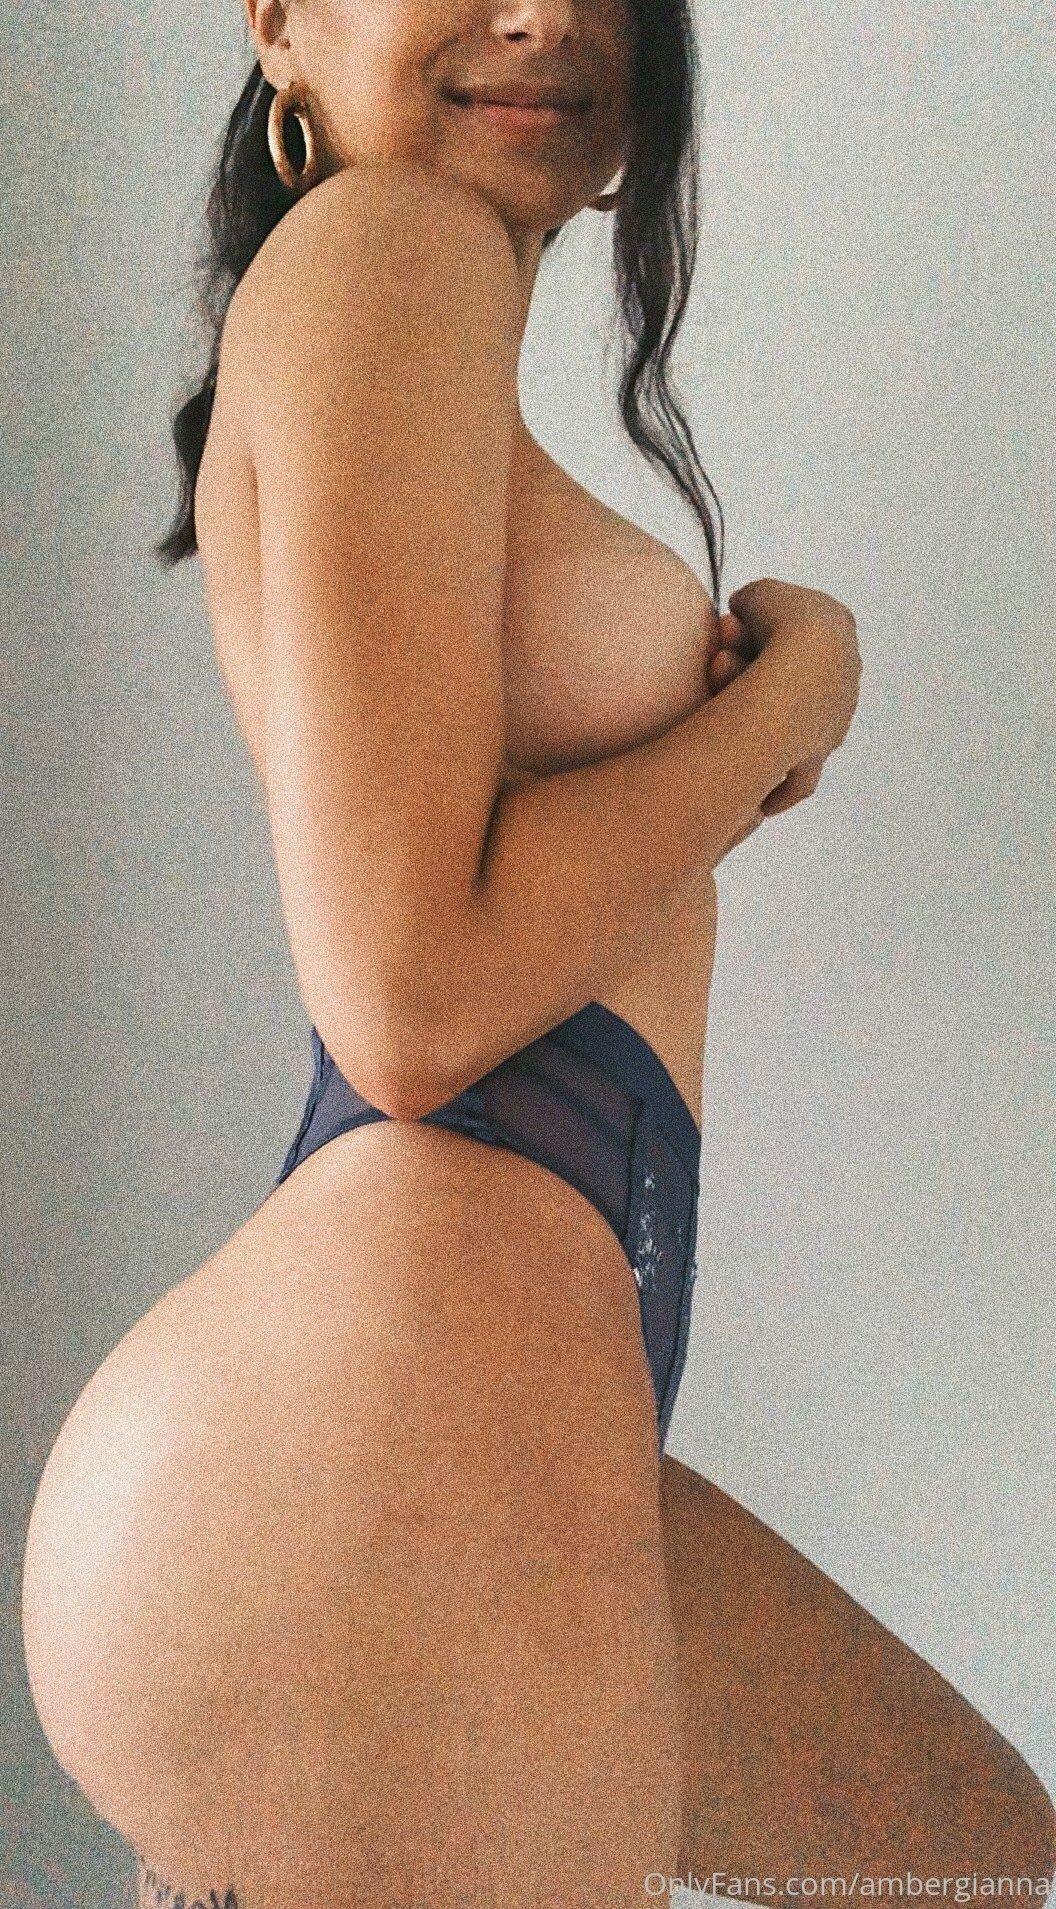 Amber Gianna Leaked 0135